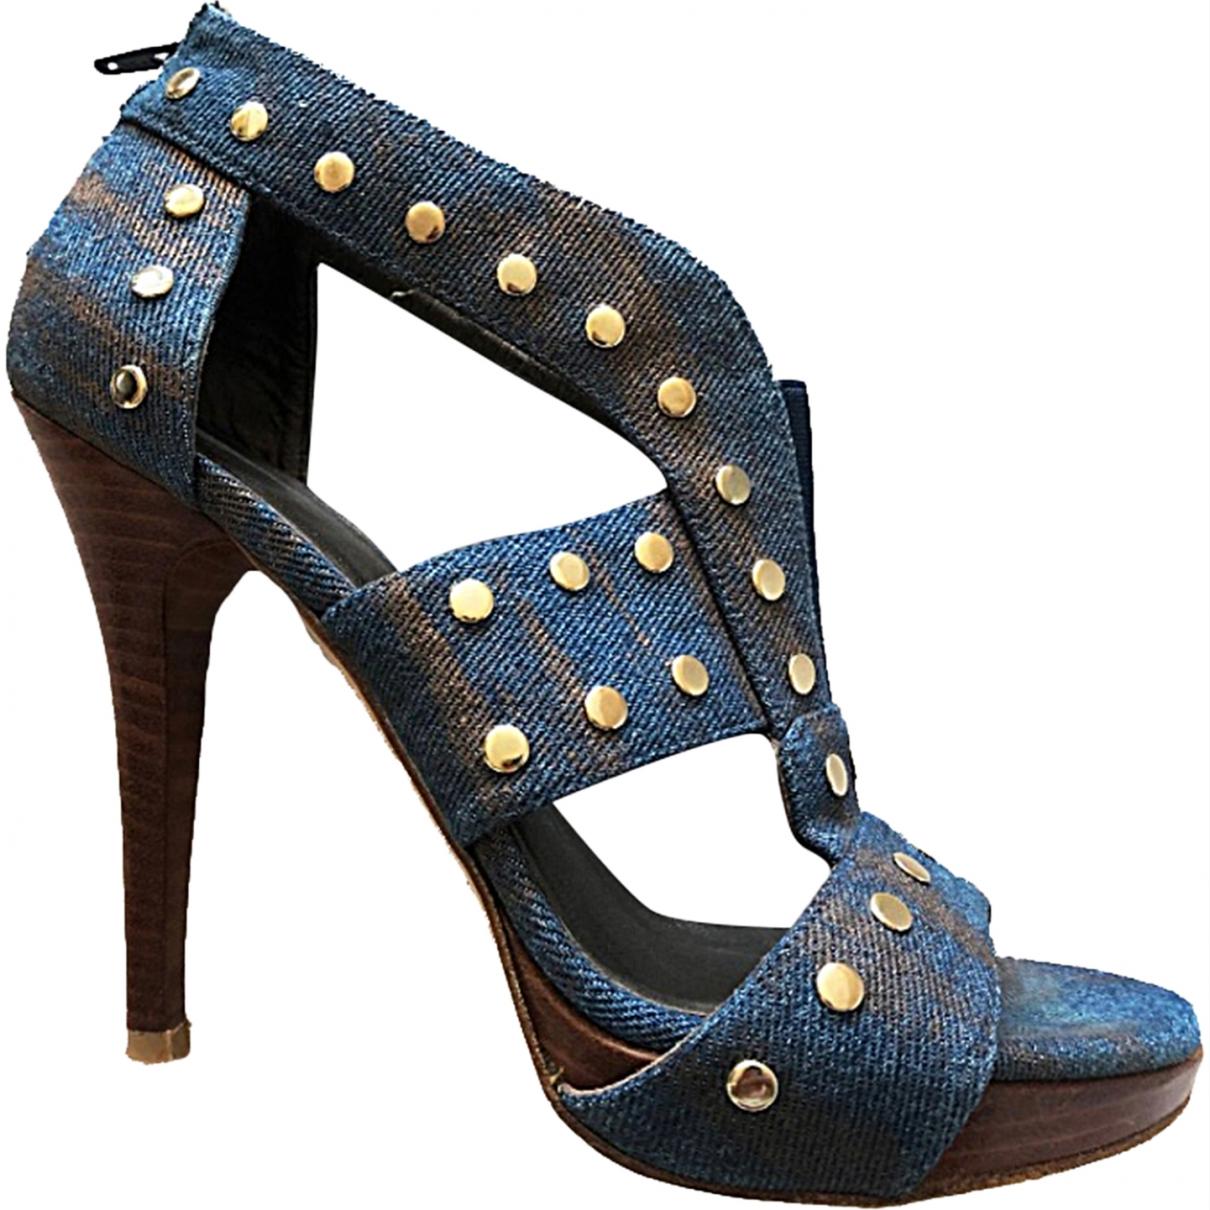 Stuart Weitzman \N Blue Cloth Sandals for Women 38.5 EU